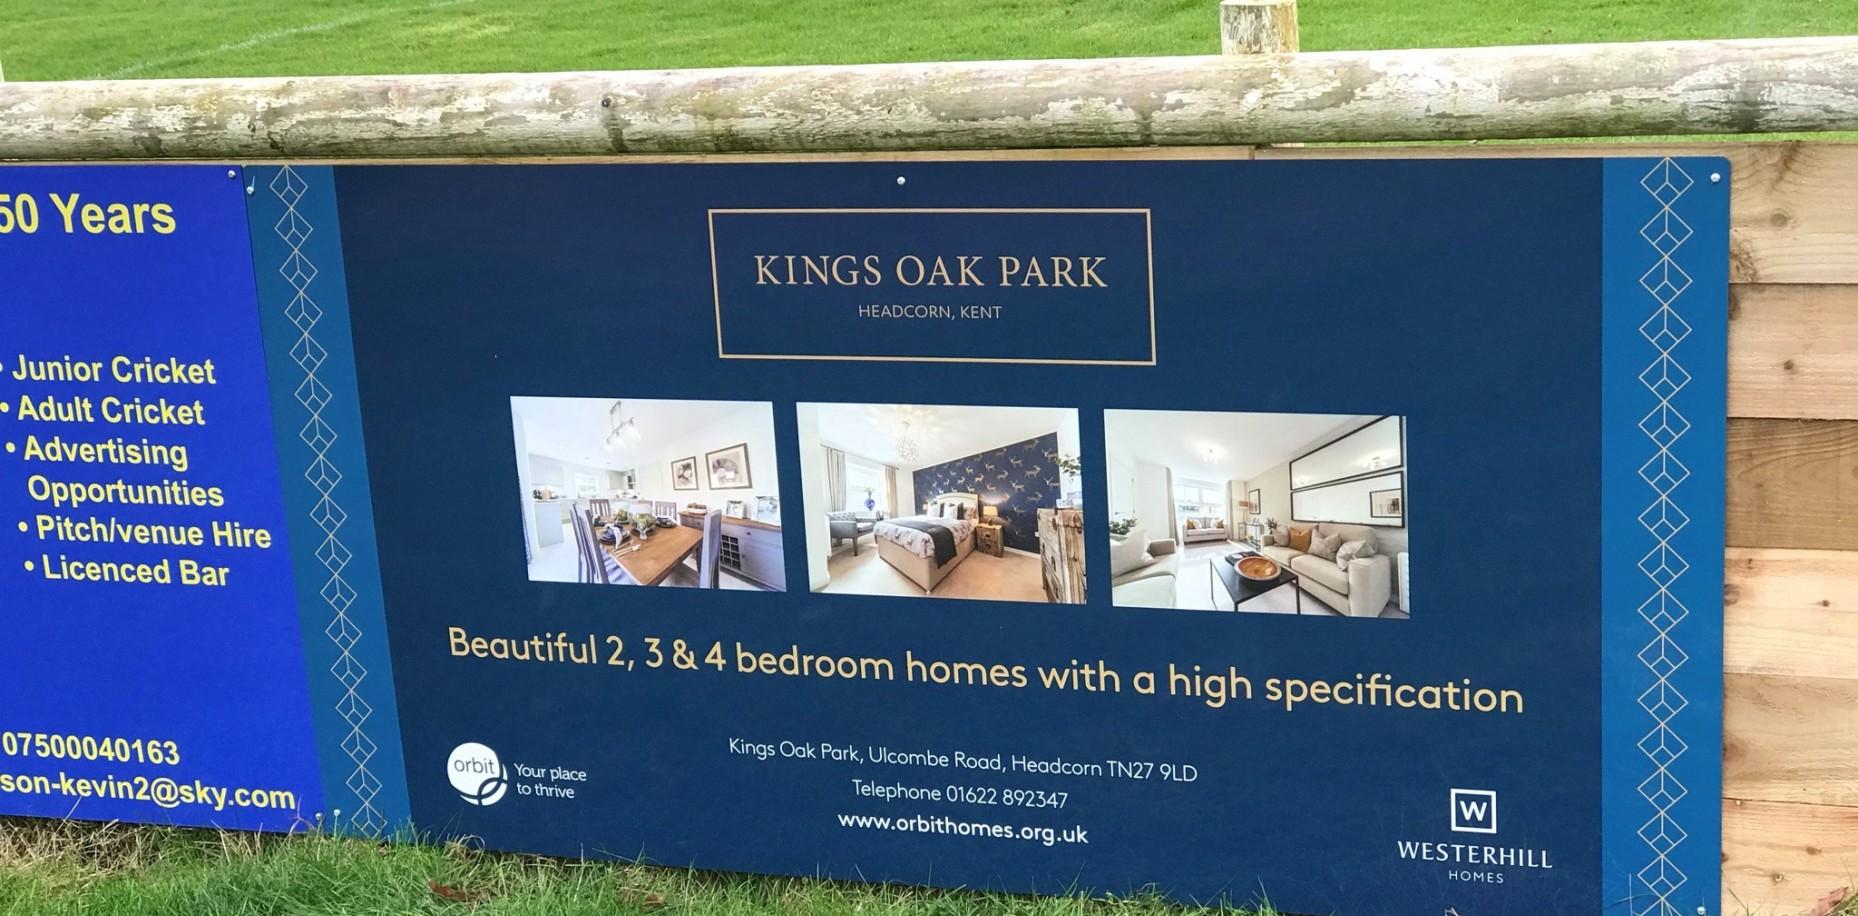 Kings Oak Park, Headcorn supports the local village football club